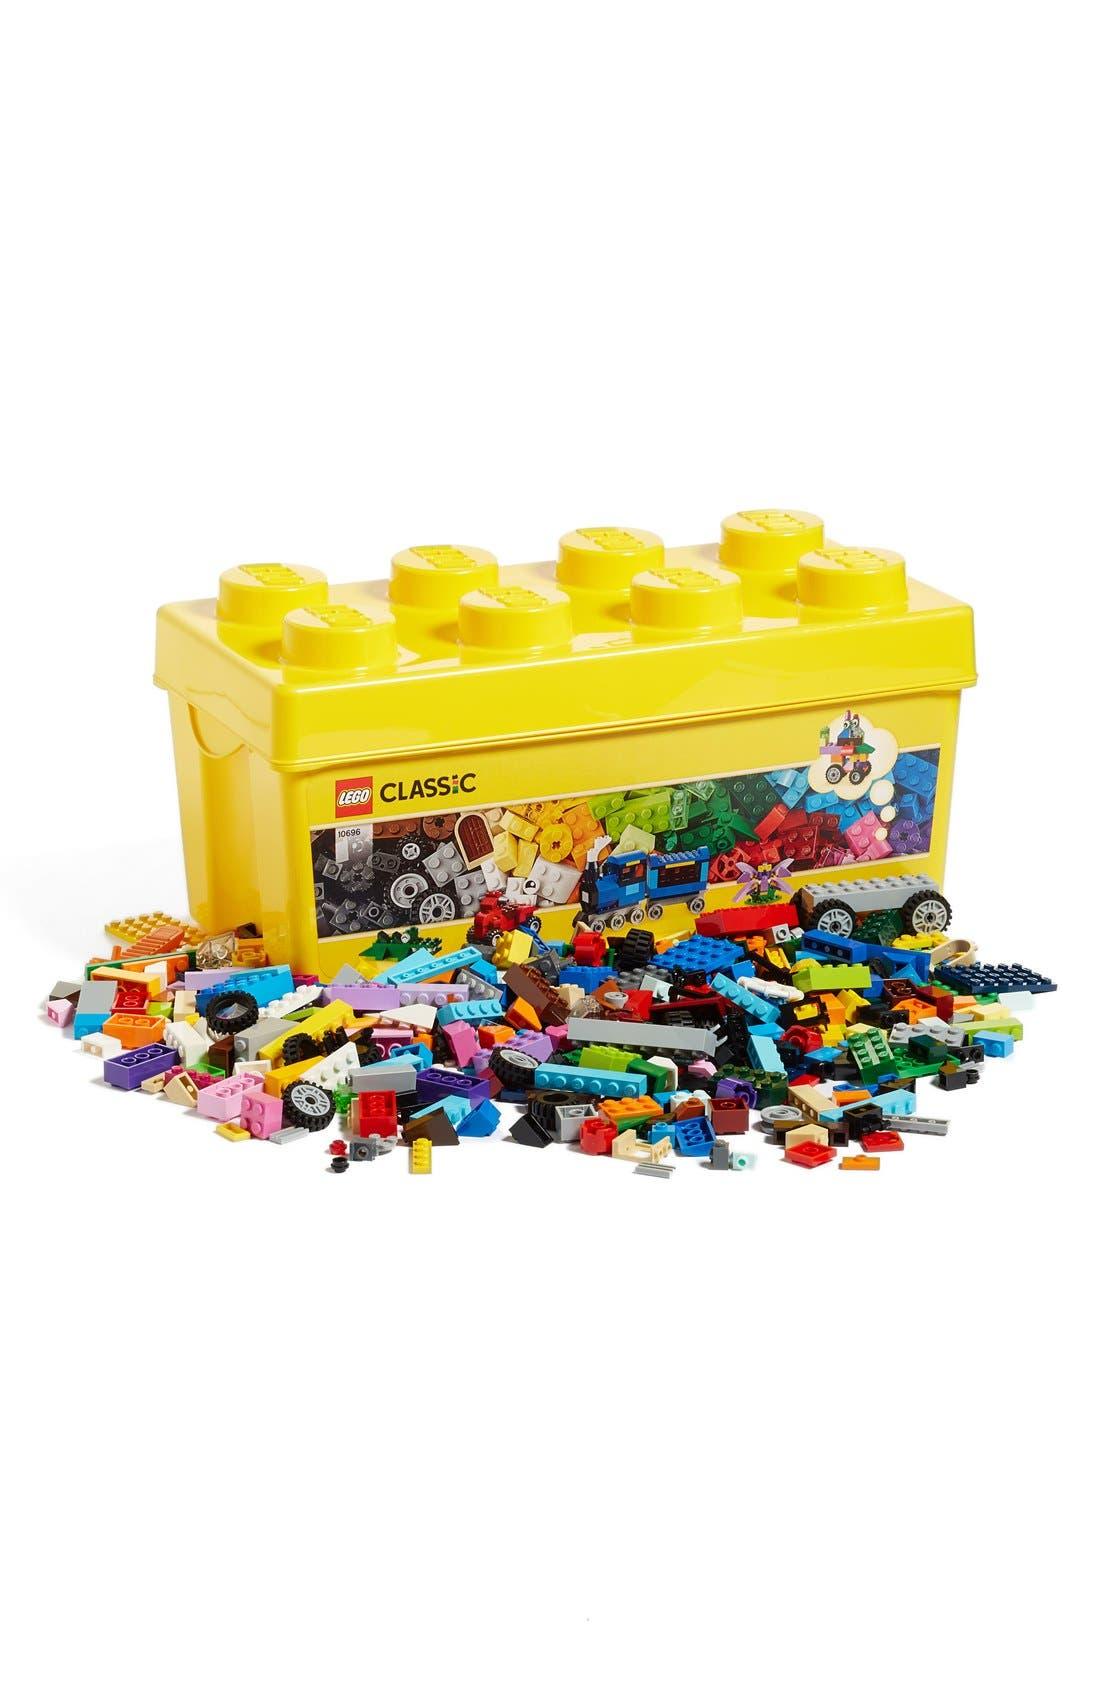 Classic Medium Creative Brick Box - 10696,                             Alternate thumbnail 3, color,                             MULTI